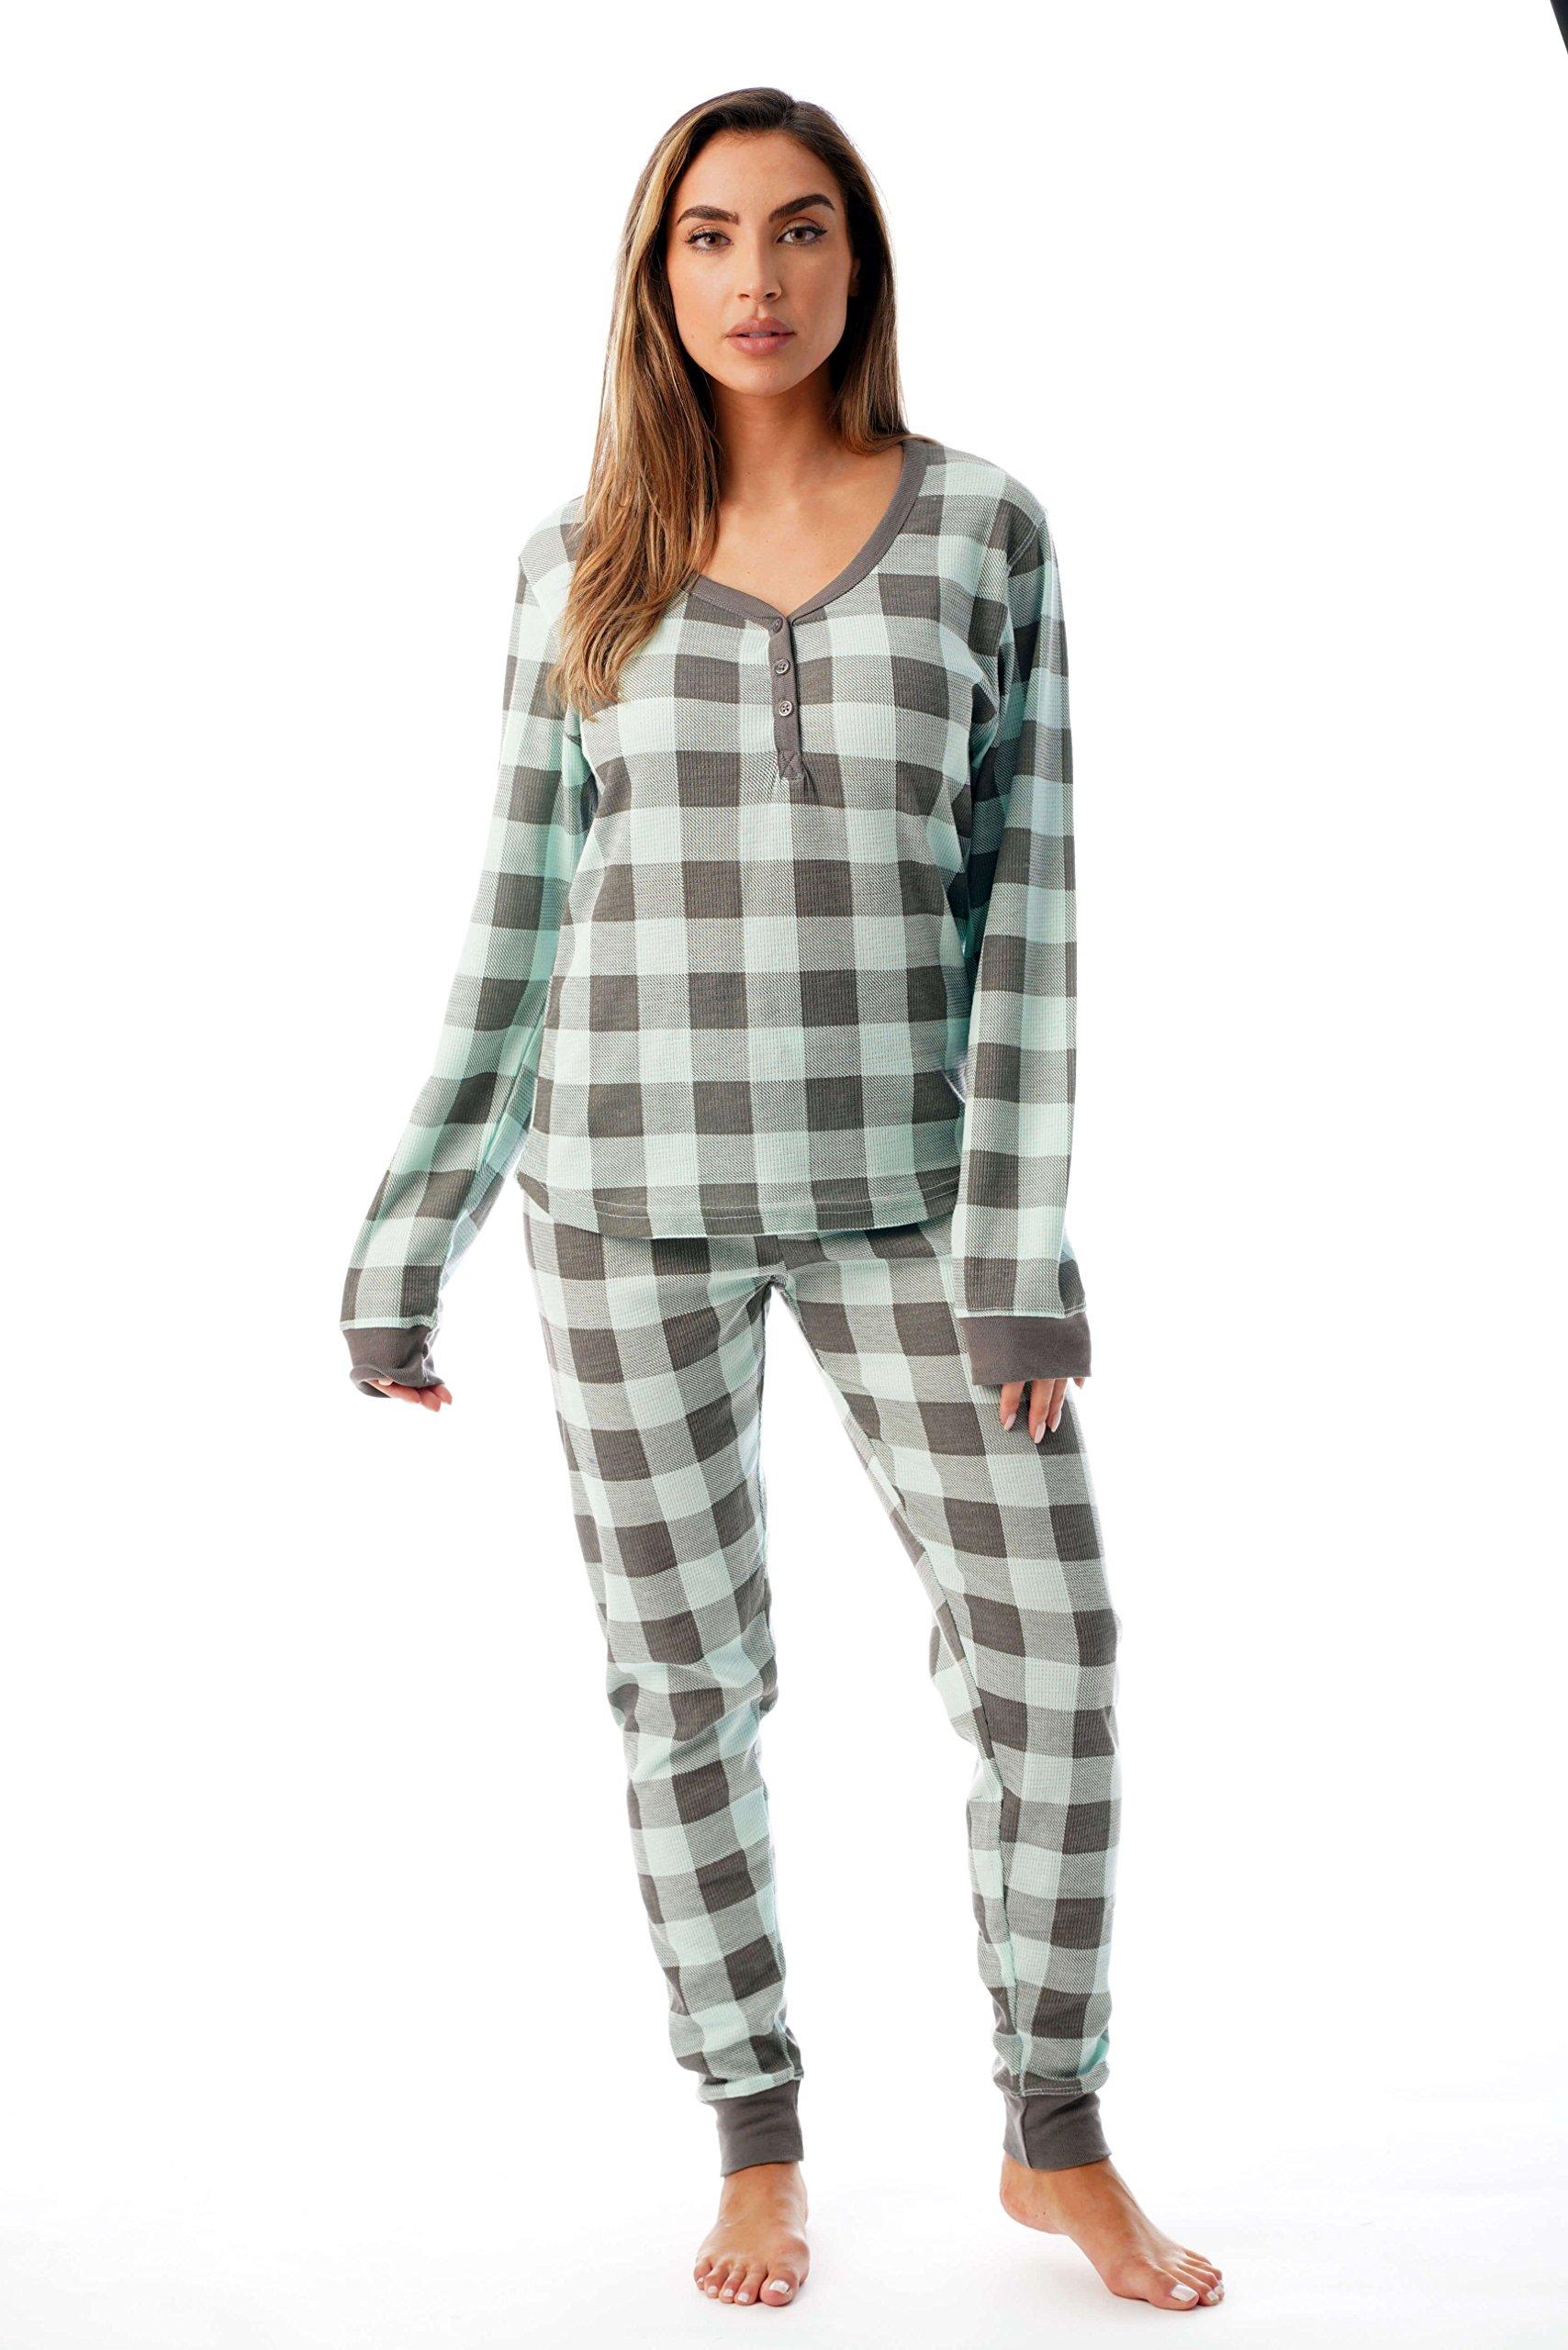 #followme Buffalo Plaid 2 Piece Base Layer Thermal Underwear Set for Women 6372-10195-NEW-MNT-M by #followme